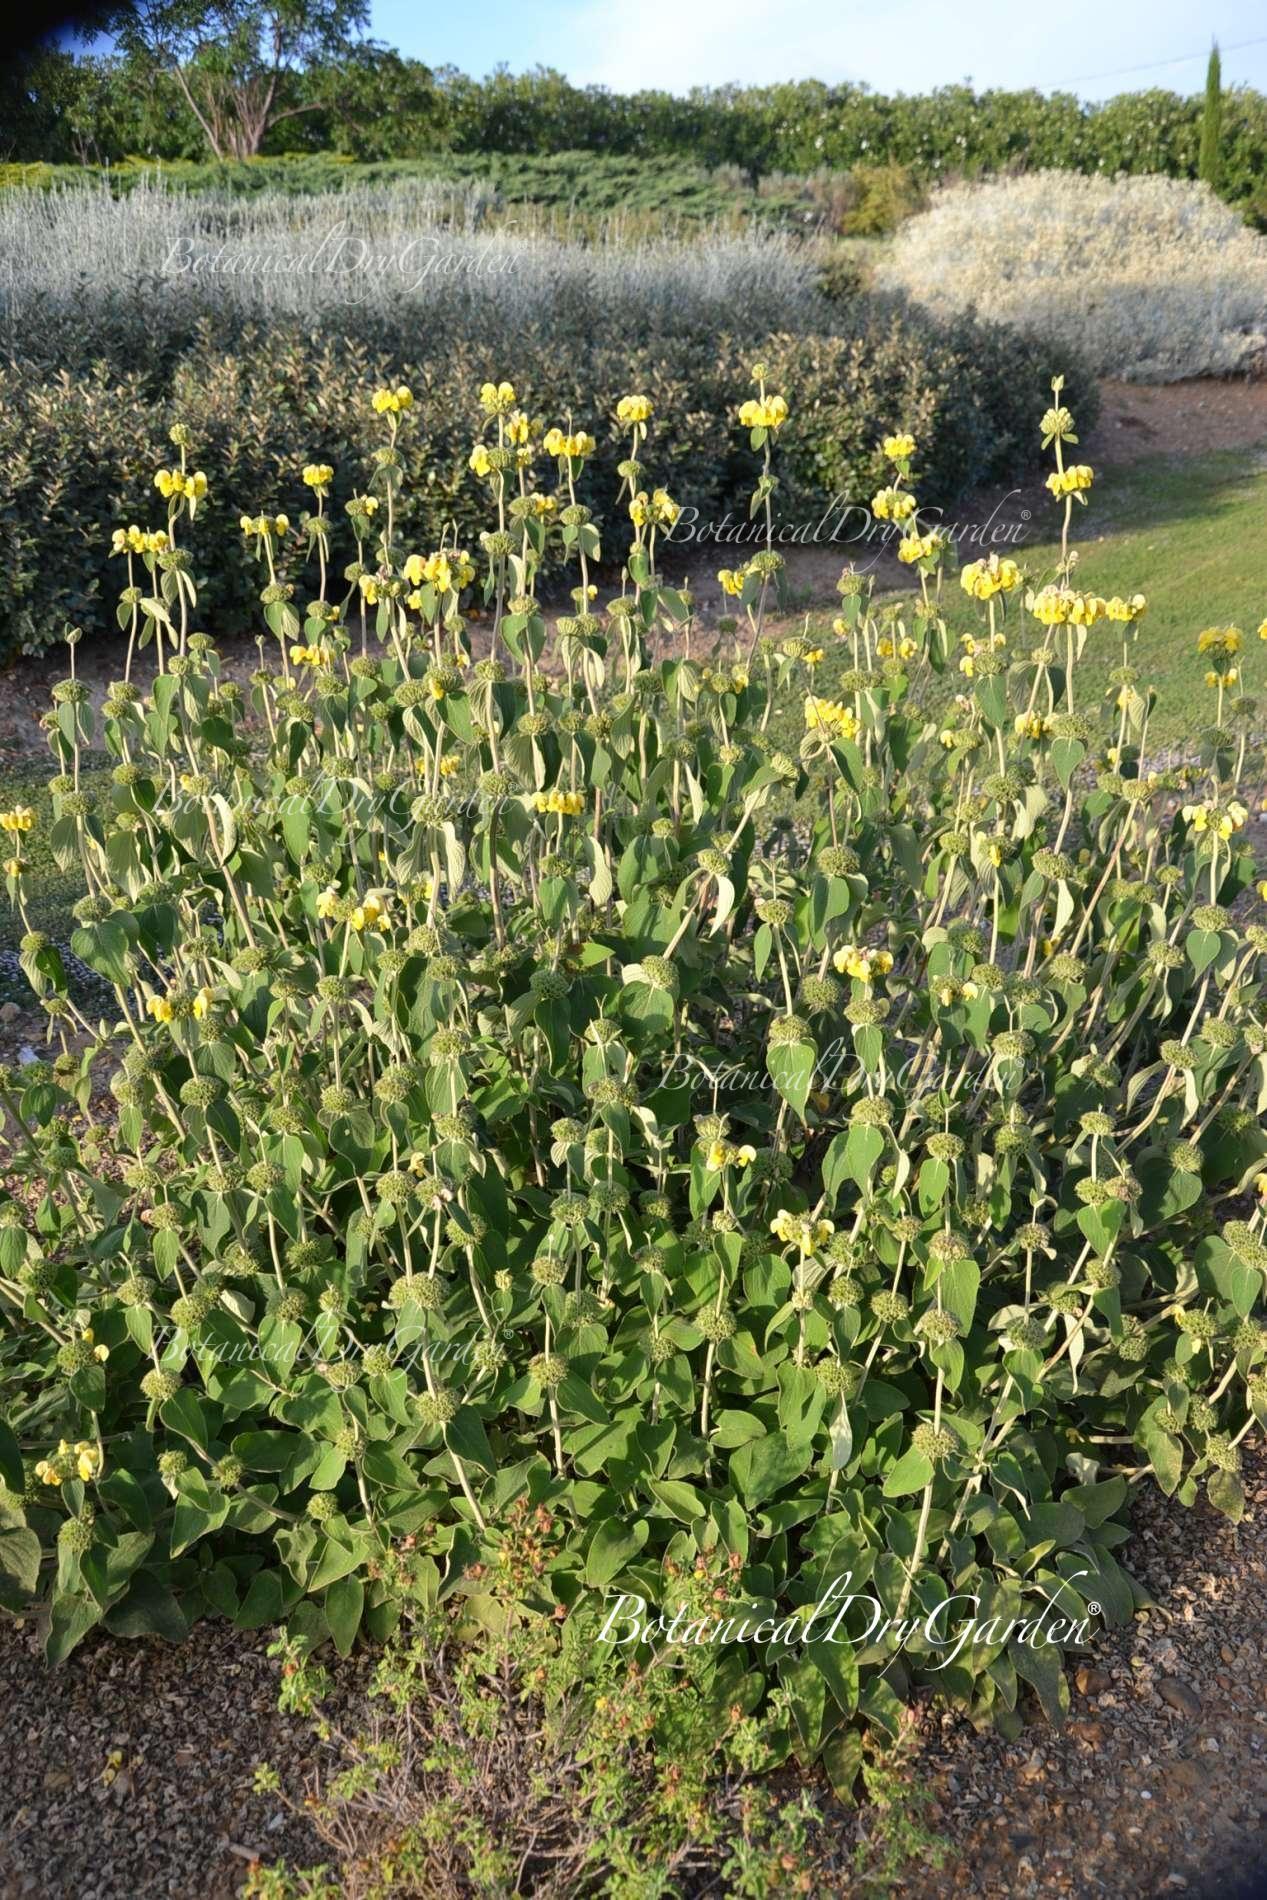 Arbusto A Fiori Gialli phlomis x 'edward bowles'   fiori gialli, fioritura, fiori